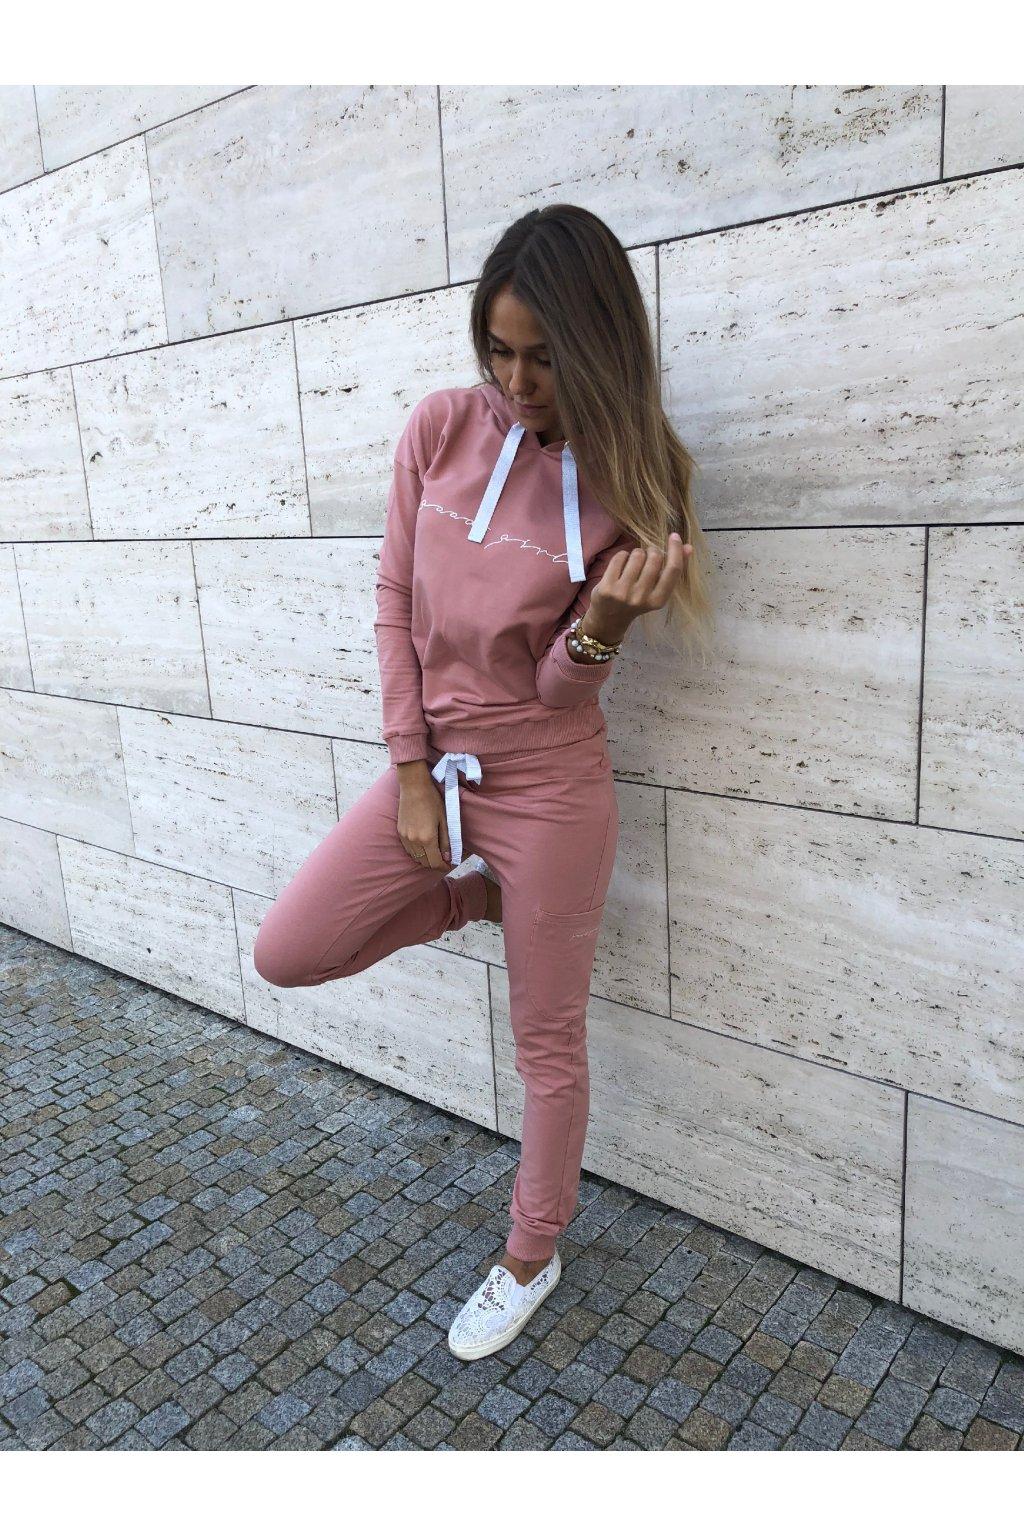 damska teplakova souprava good girl rose eshopat cz 4